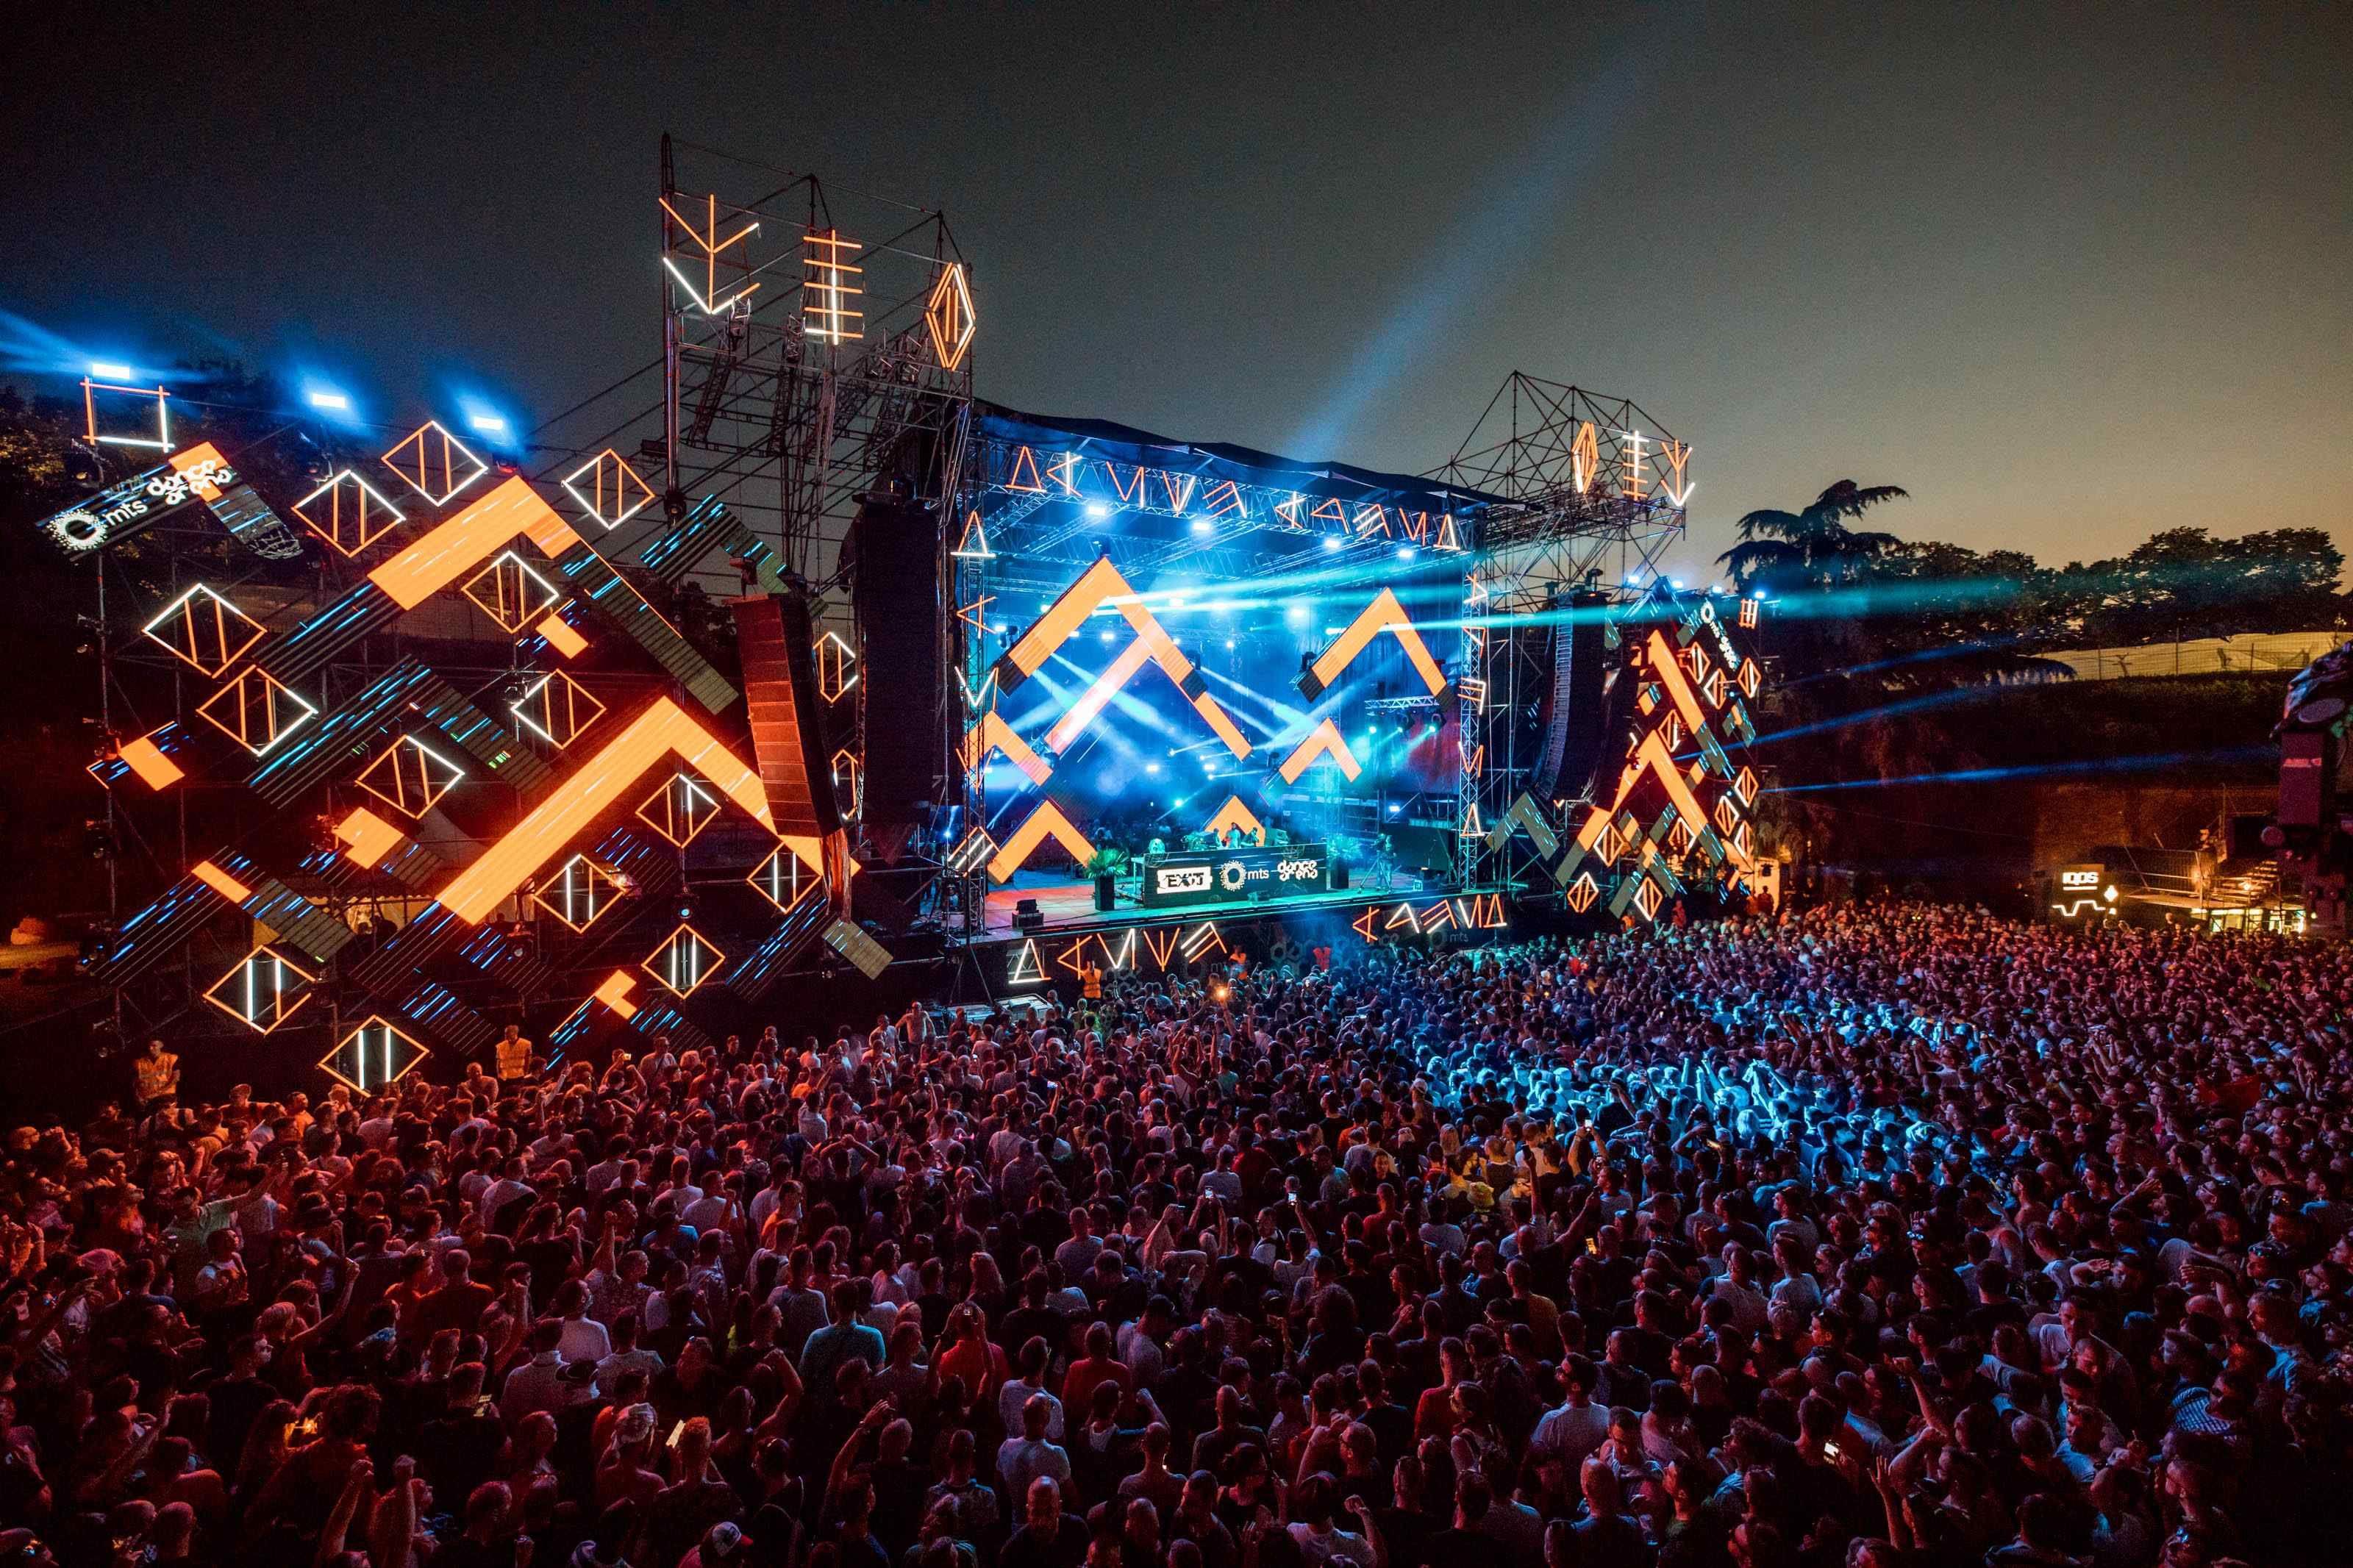 EXIT festival разкрива първите артисти за 2021 David Guetta, DJ Snake, Tyga, Eric Prydz, Four Tet, Boris Brejcha, Sepultura, Metronomy и много други!